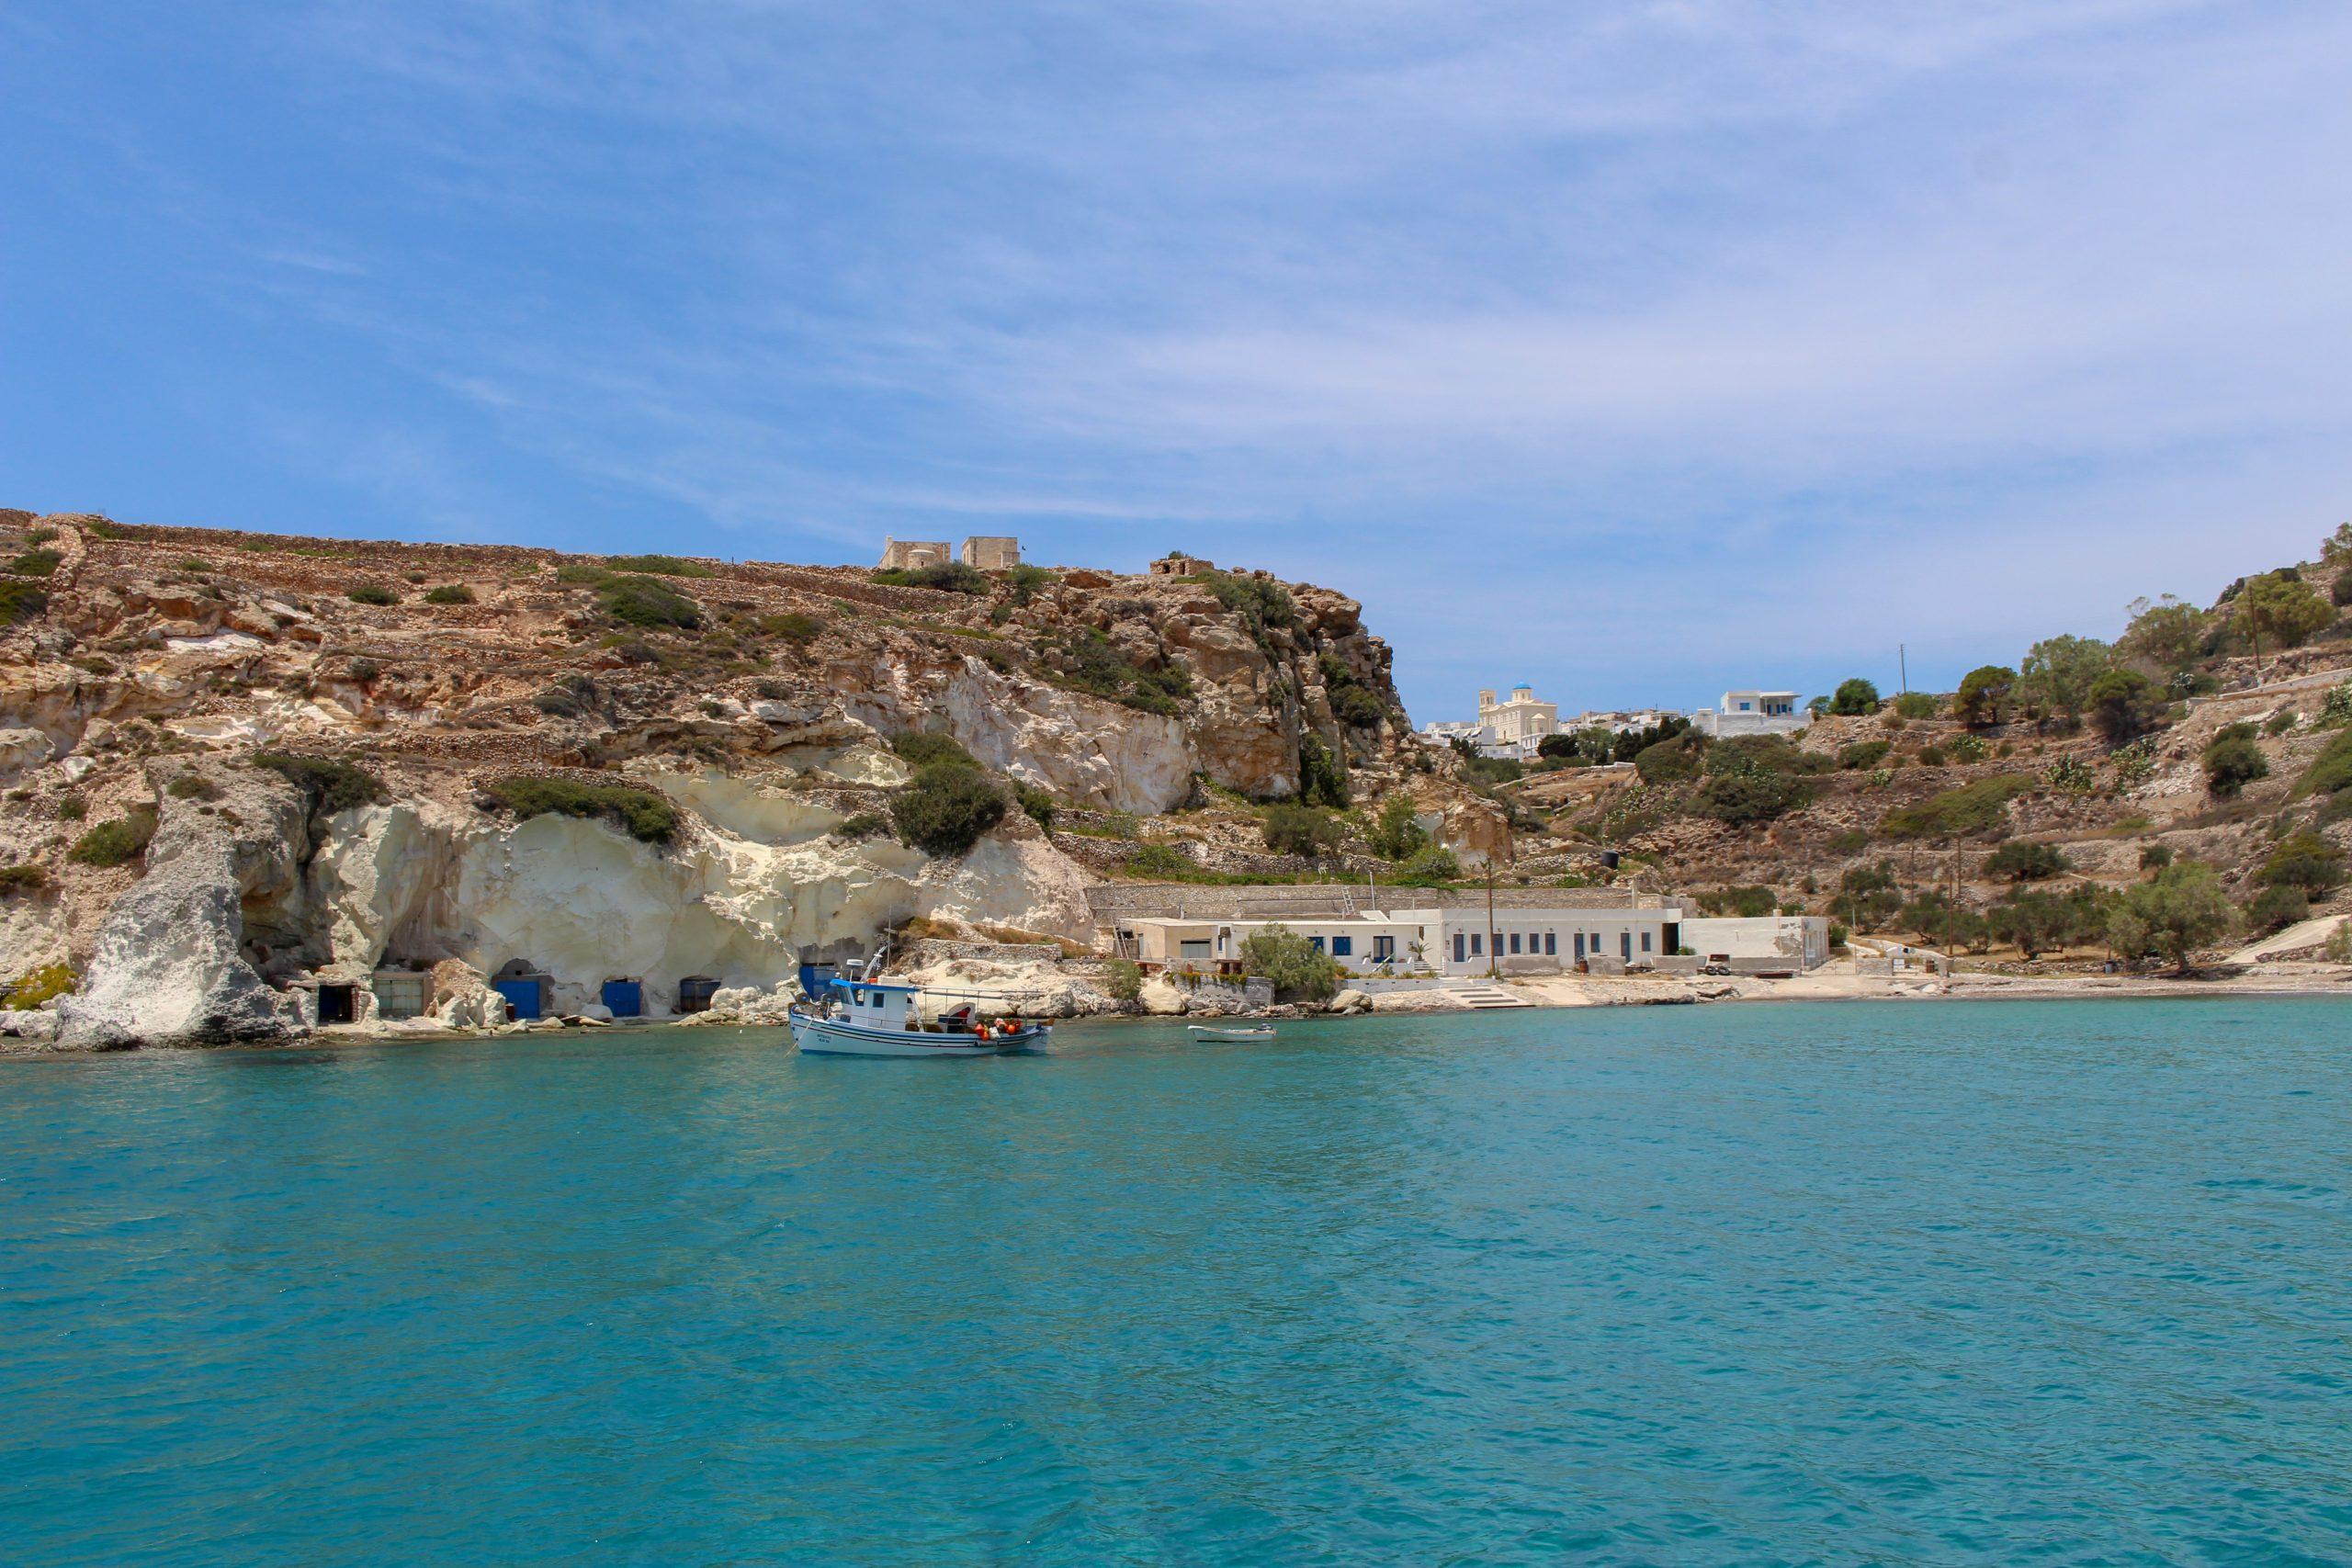 passeio_barco_paisagens